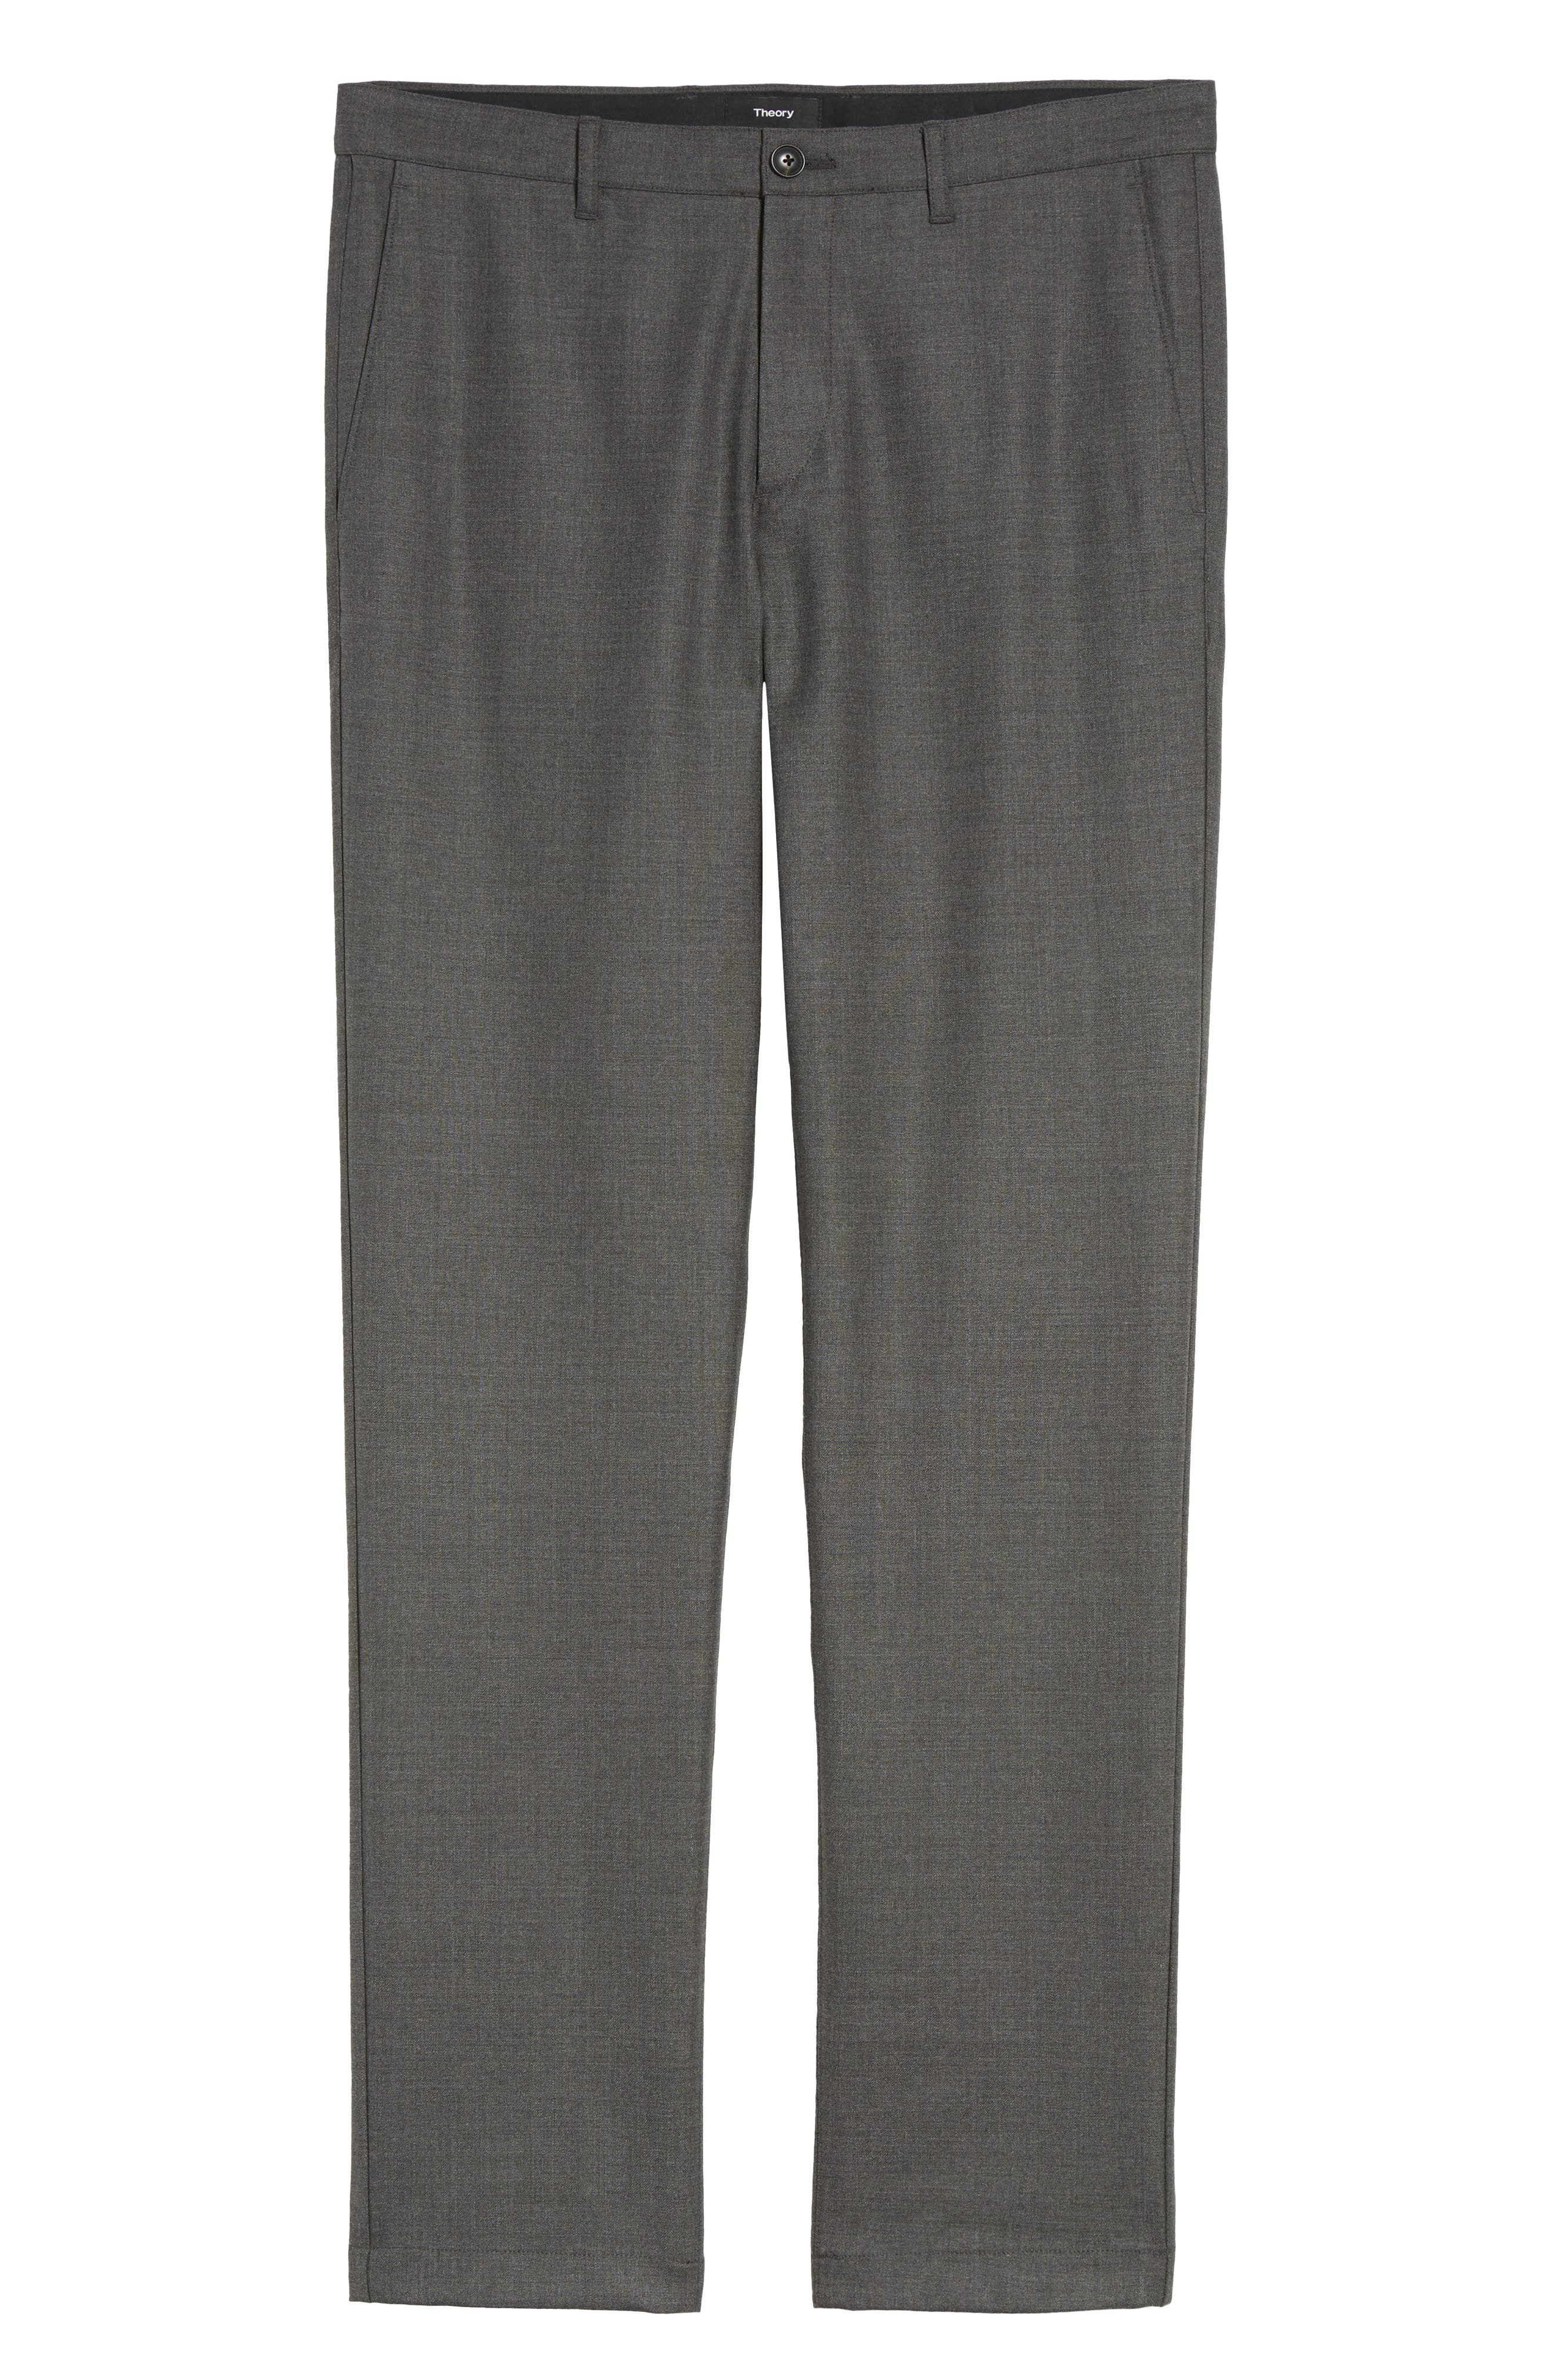 Zaine Gearheart Slim Straight Pants,                             Alternate thumbnail 6, color,                             Medium Charcoal